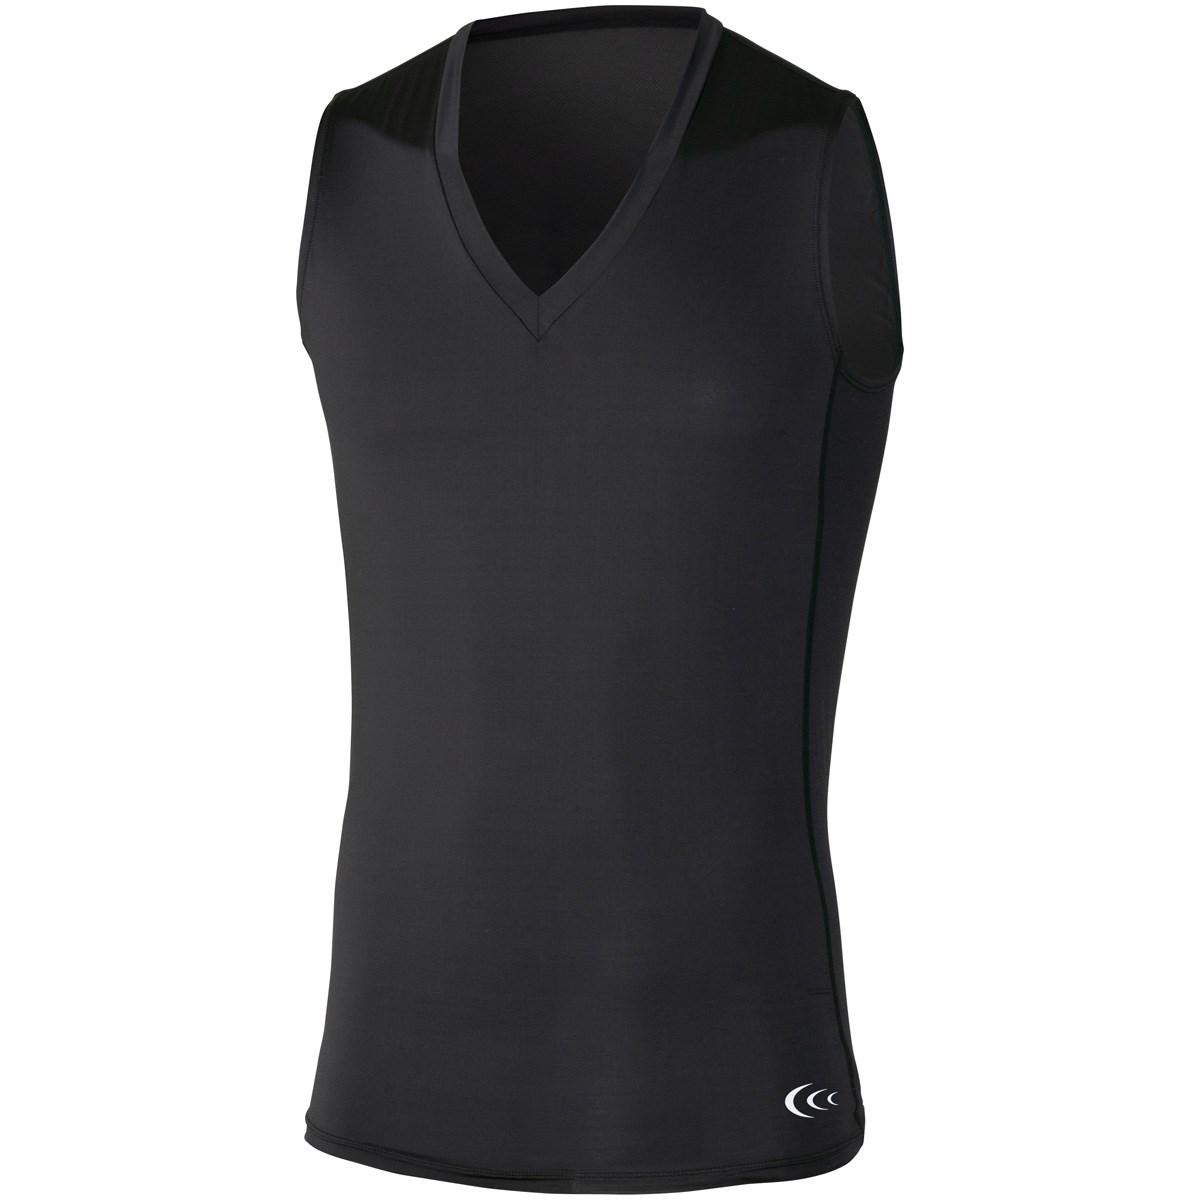 C3fit クーリングVネックスリーブレスアンダーシャツ